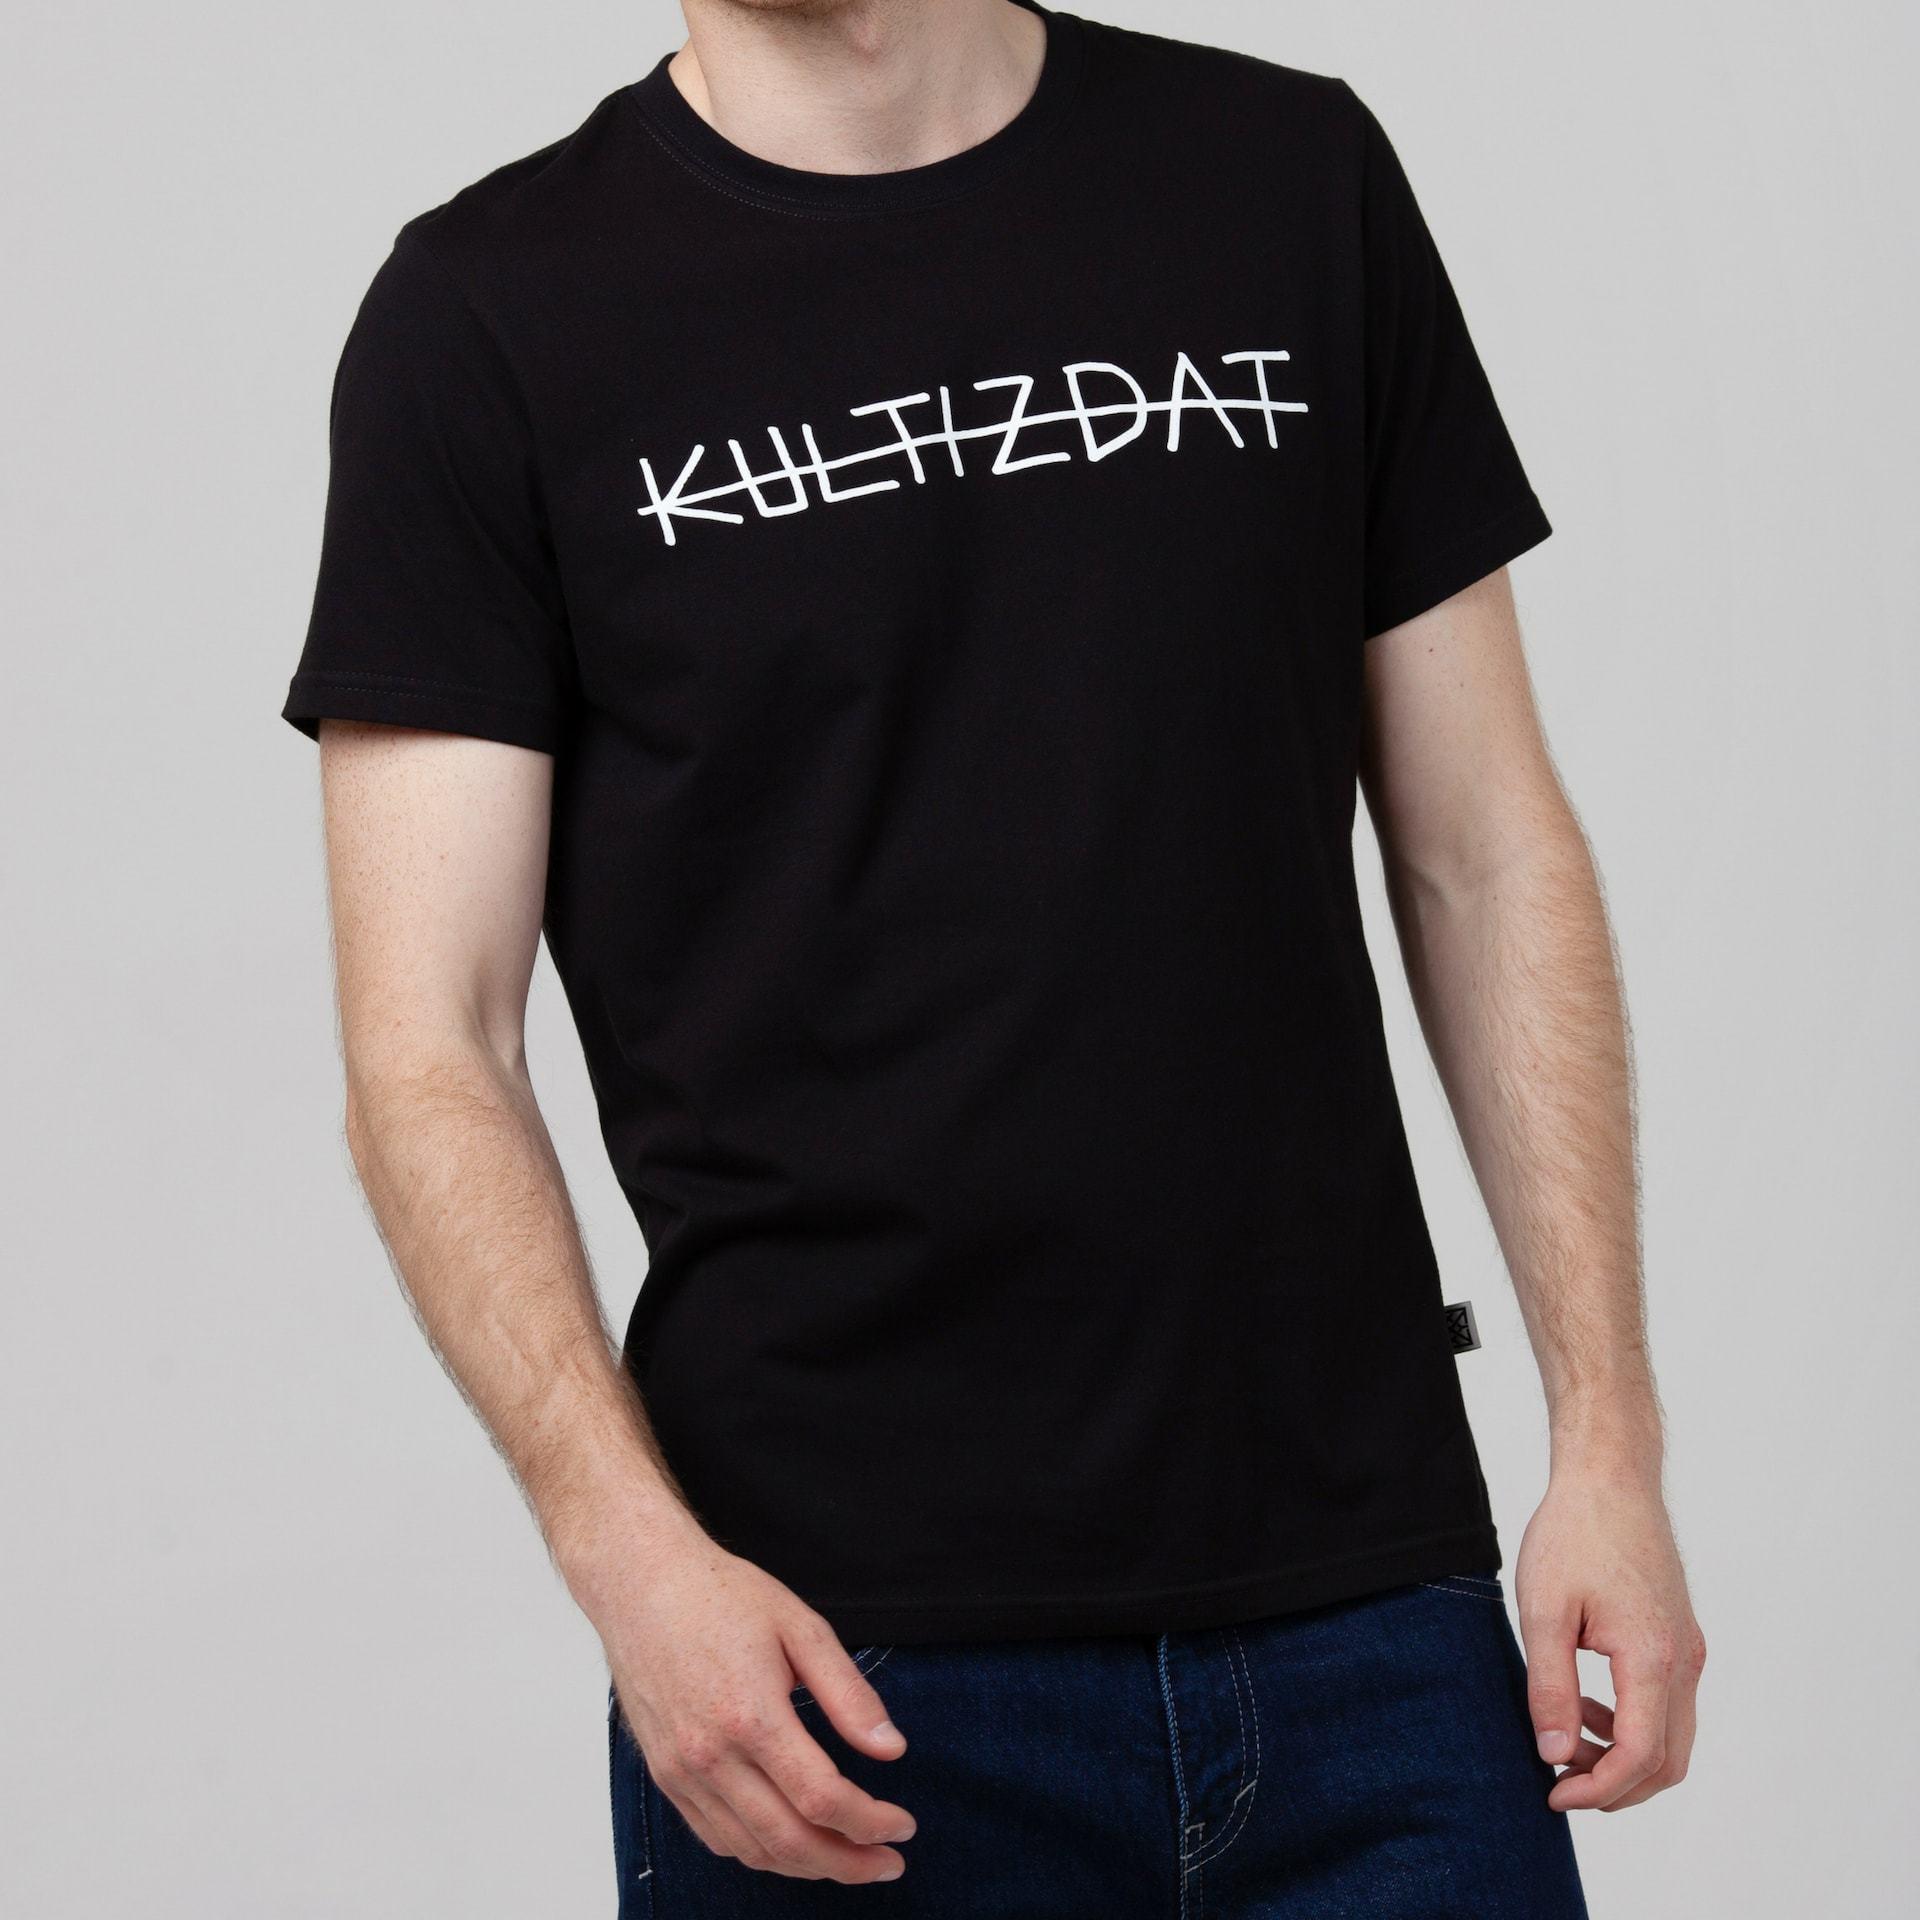 Футболка Kultizdat чёрная